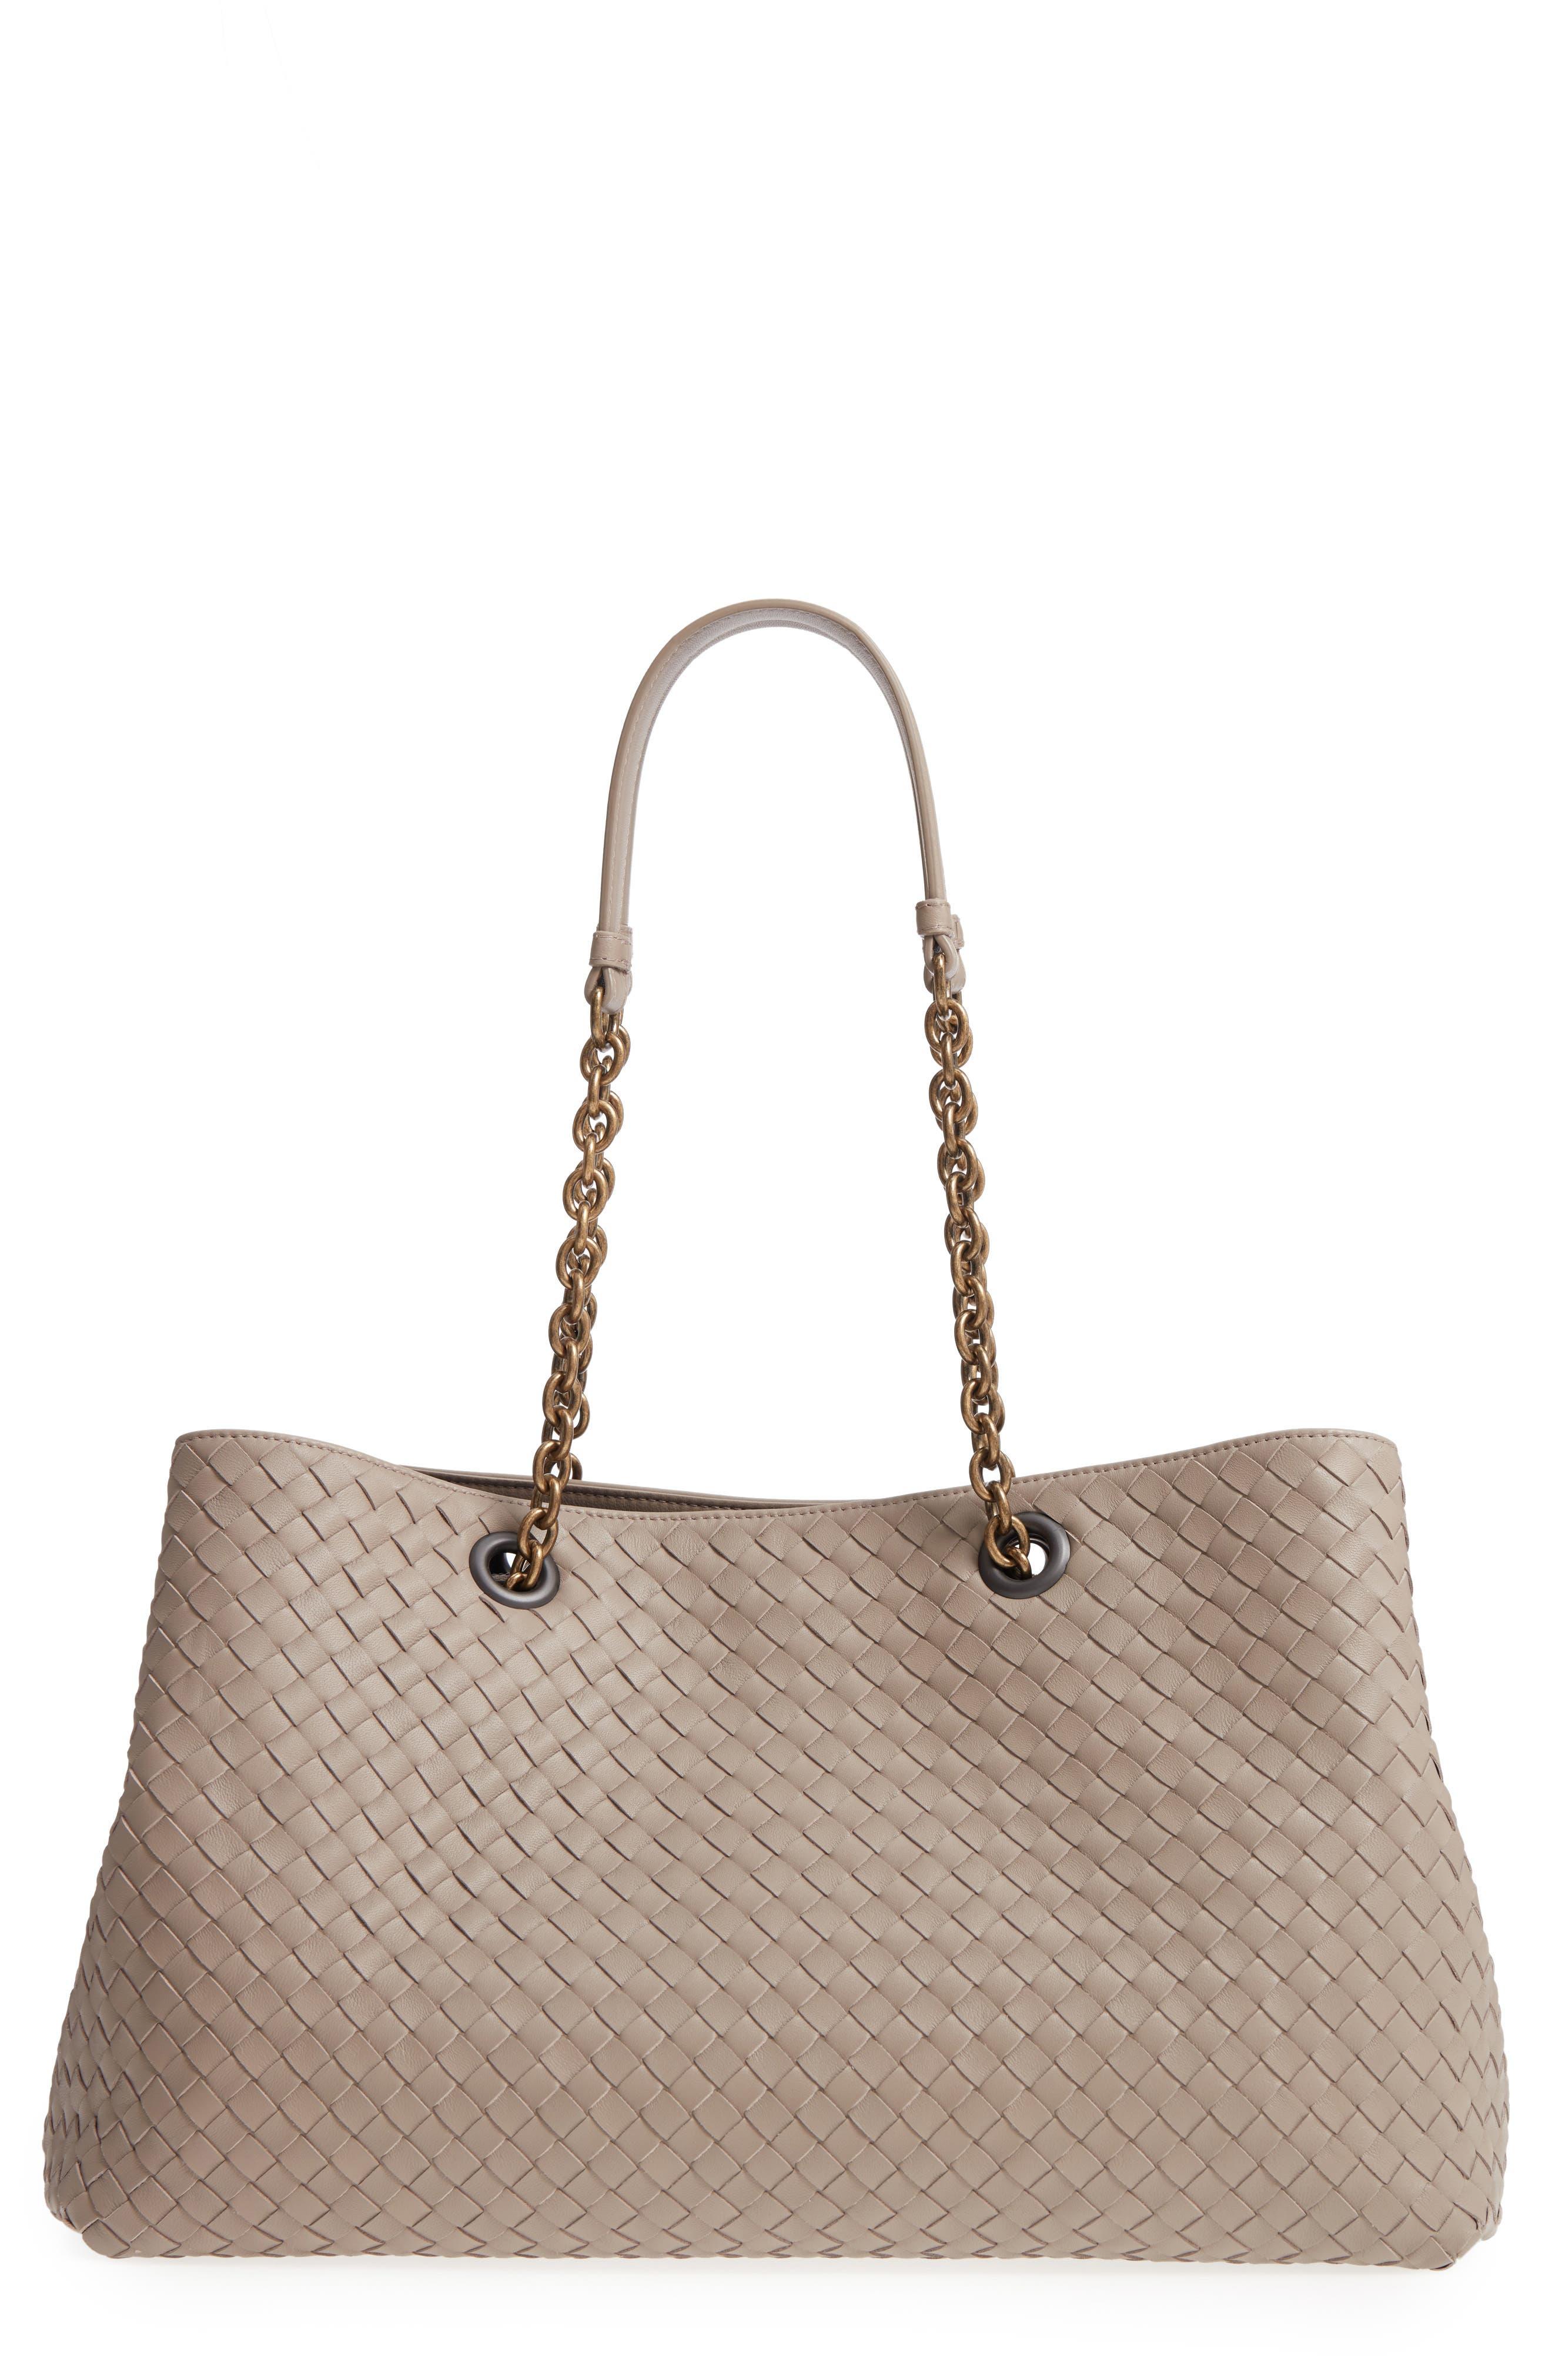 Bottega Veneta Intrecciato East/West Leather Tote Bag